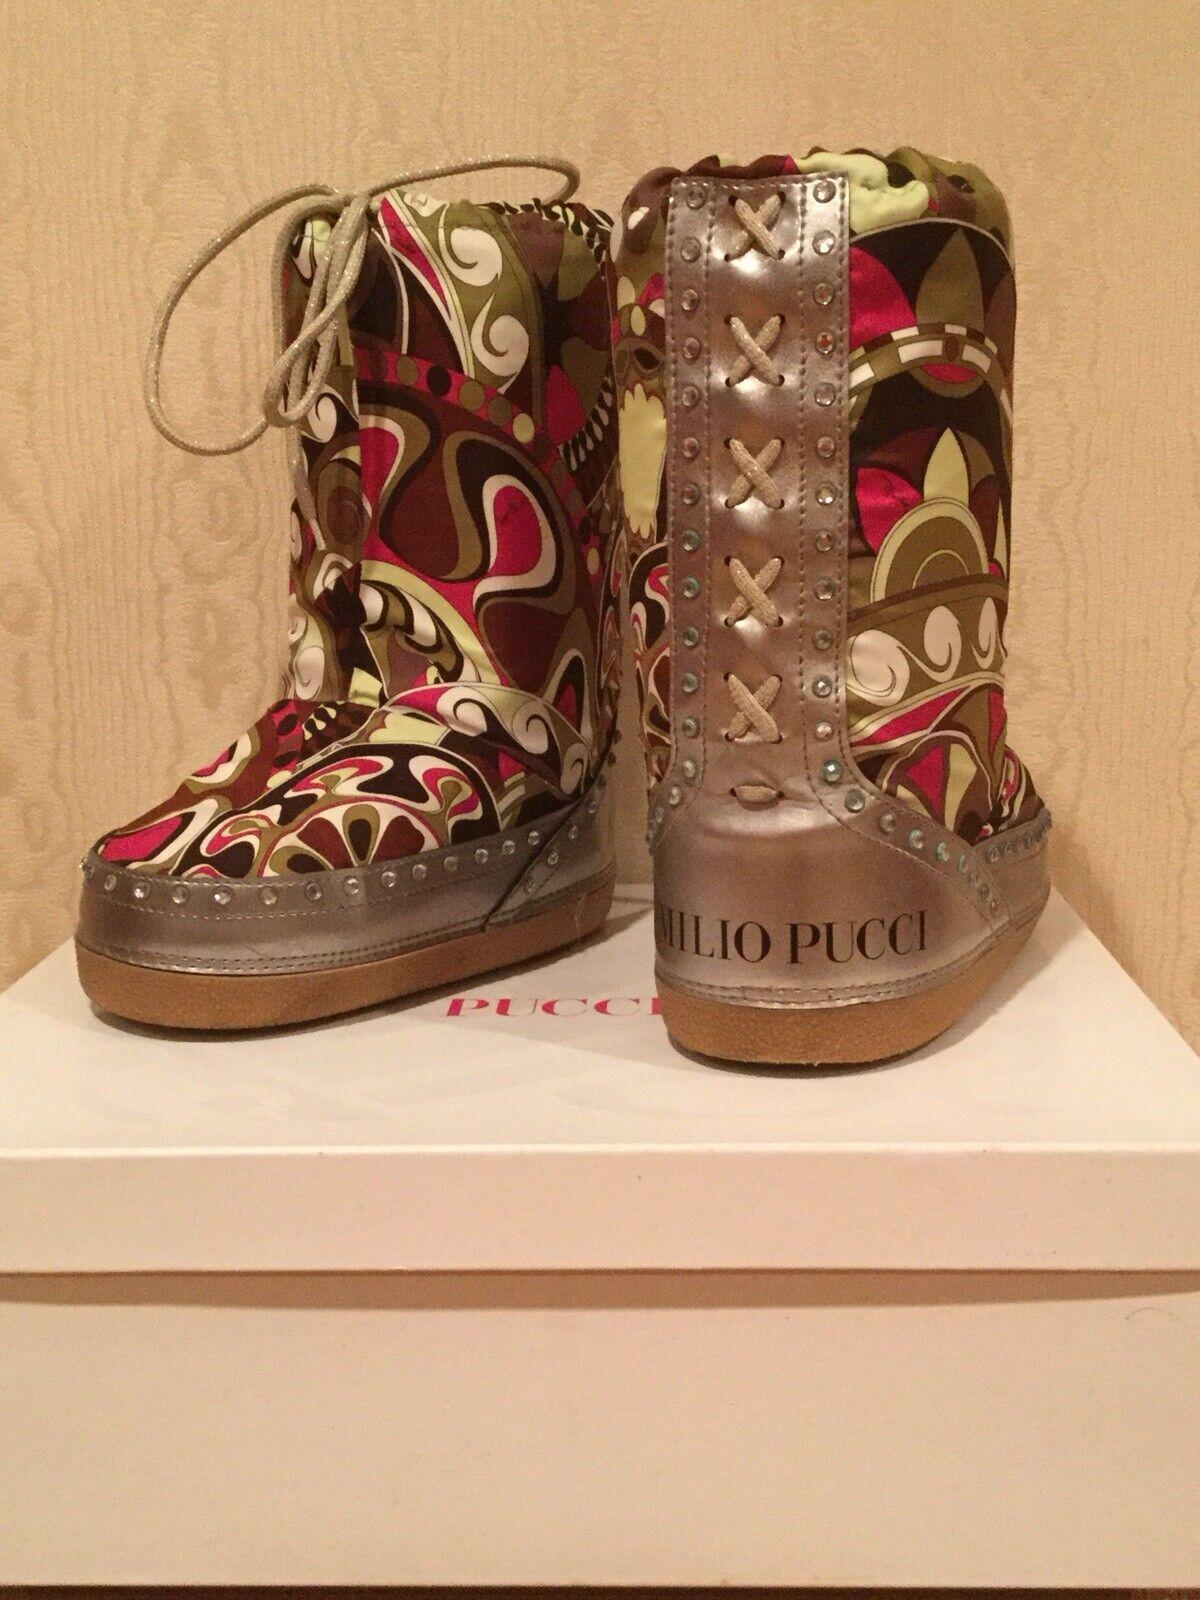 Emilio Pucci Printed Flat Snow Boots, Multicolor,Size 36 US 6